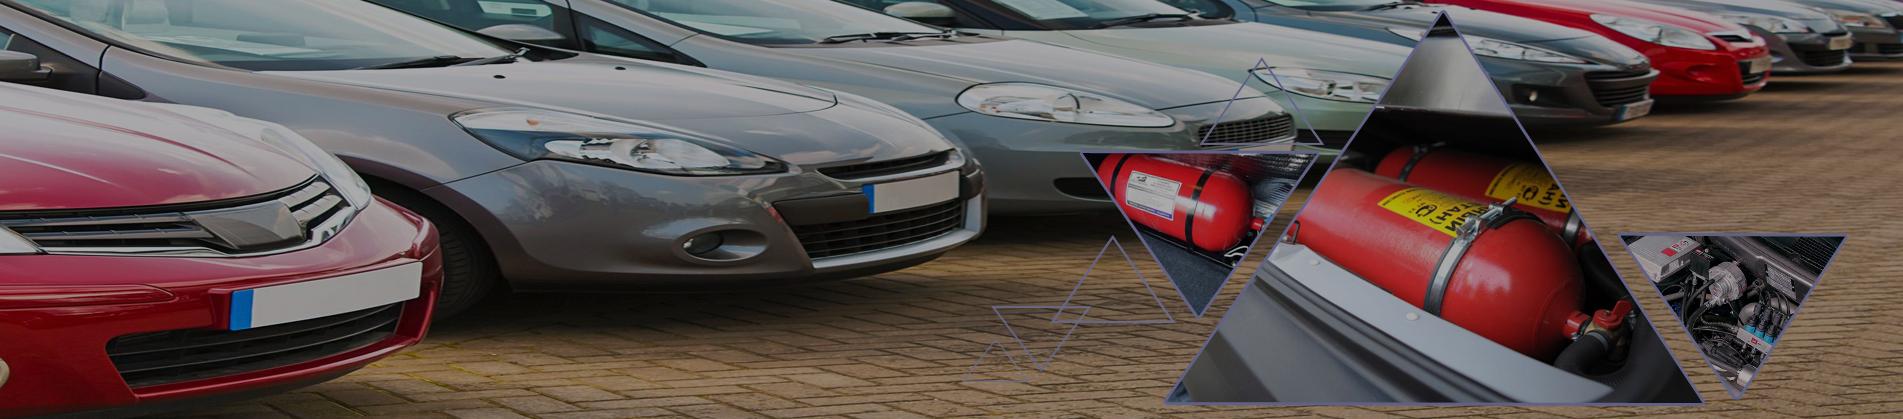 Перевод автомобилей на метан